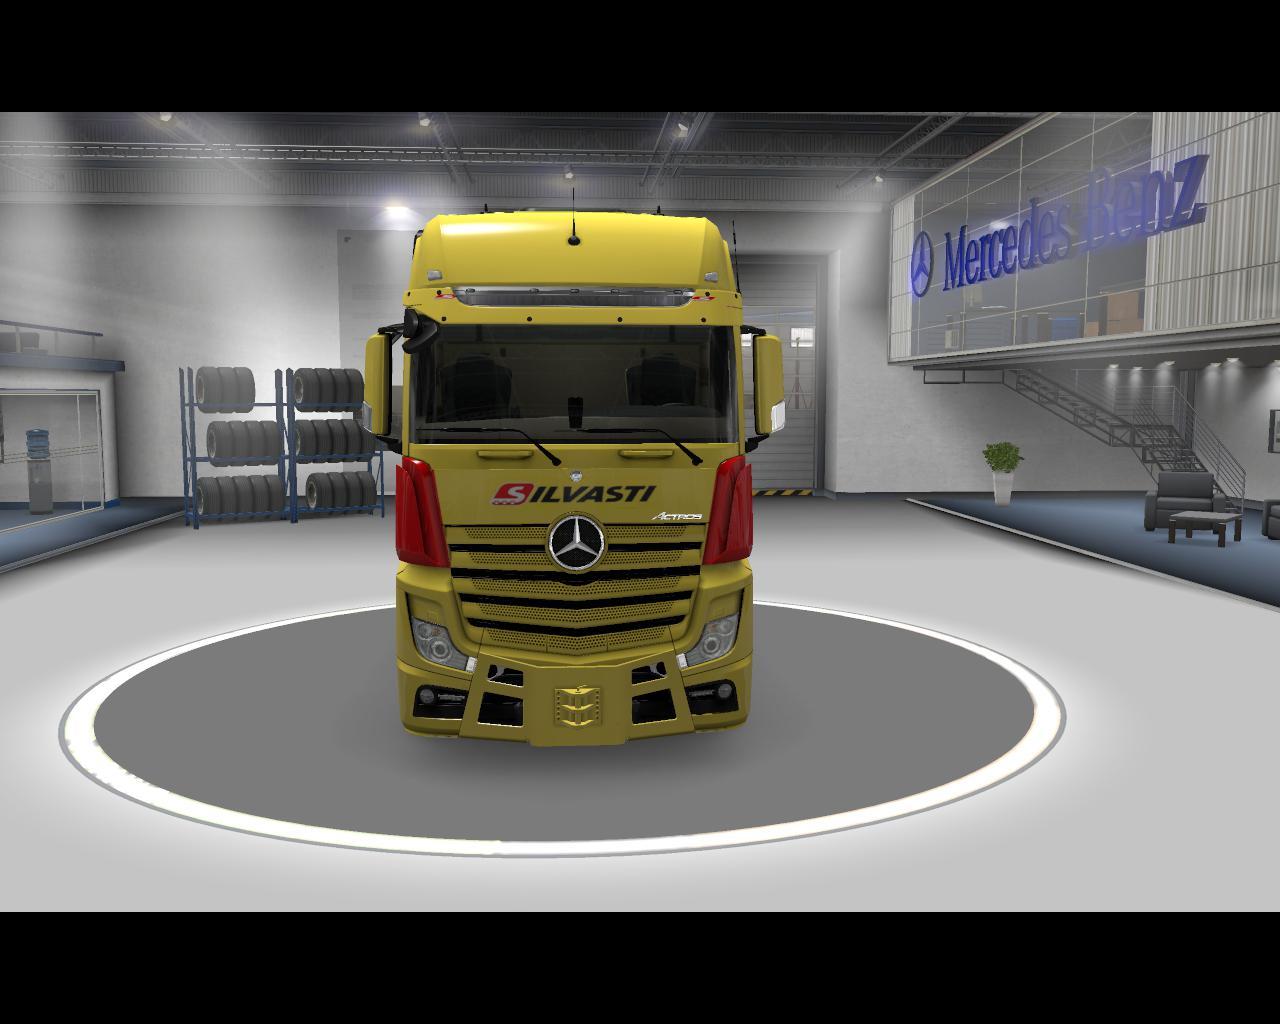 ETS2 - Mercedes-Benz Actros Silvasti Skins Fix V2.5 (1.37.x)